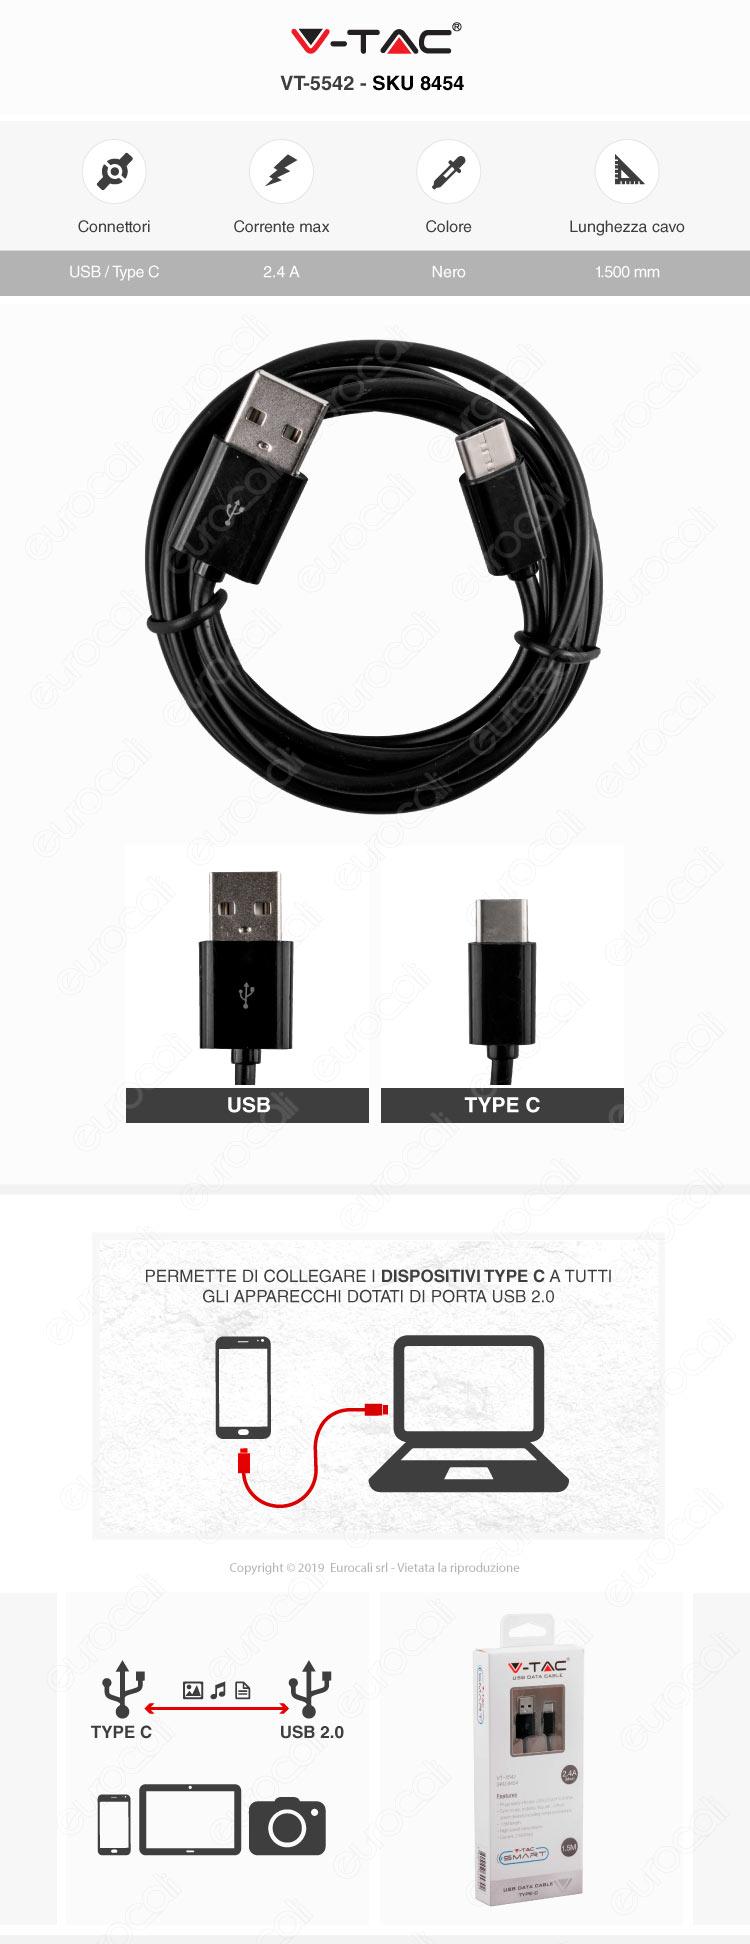 V-Tac VT-5542 USB Data Cable Type-C Cavo Nero 1,5m